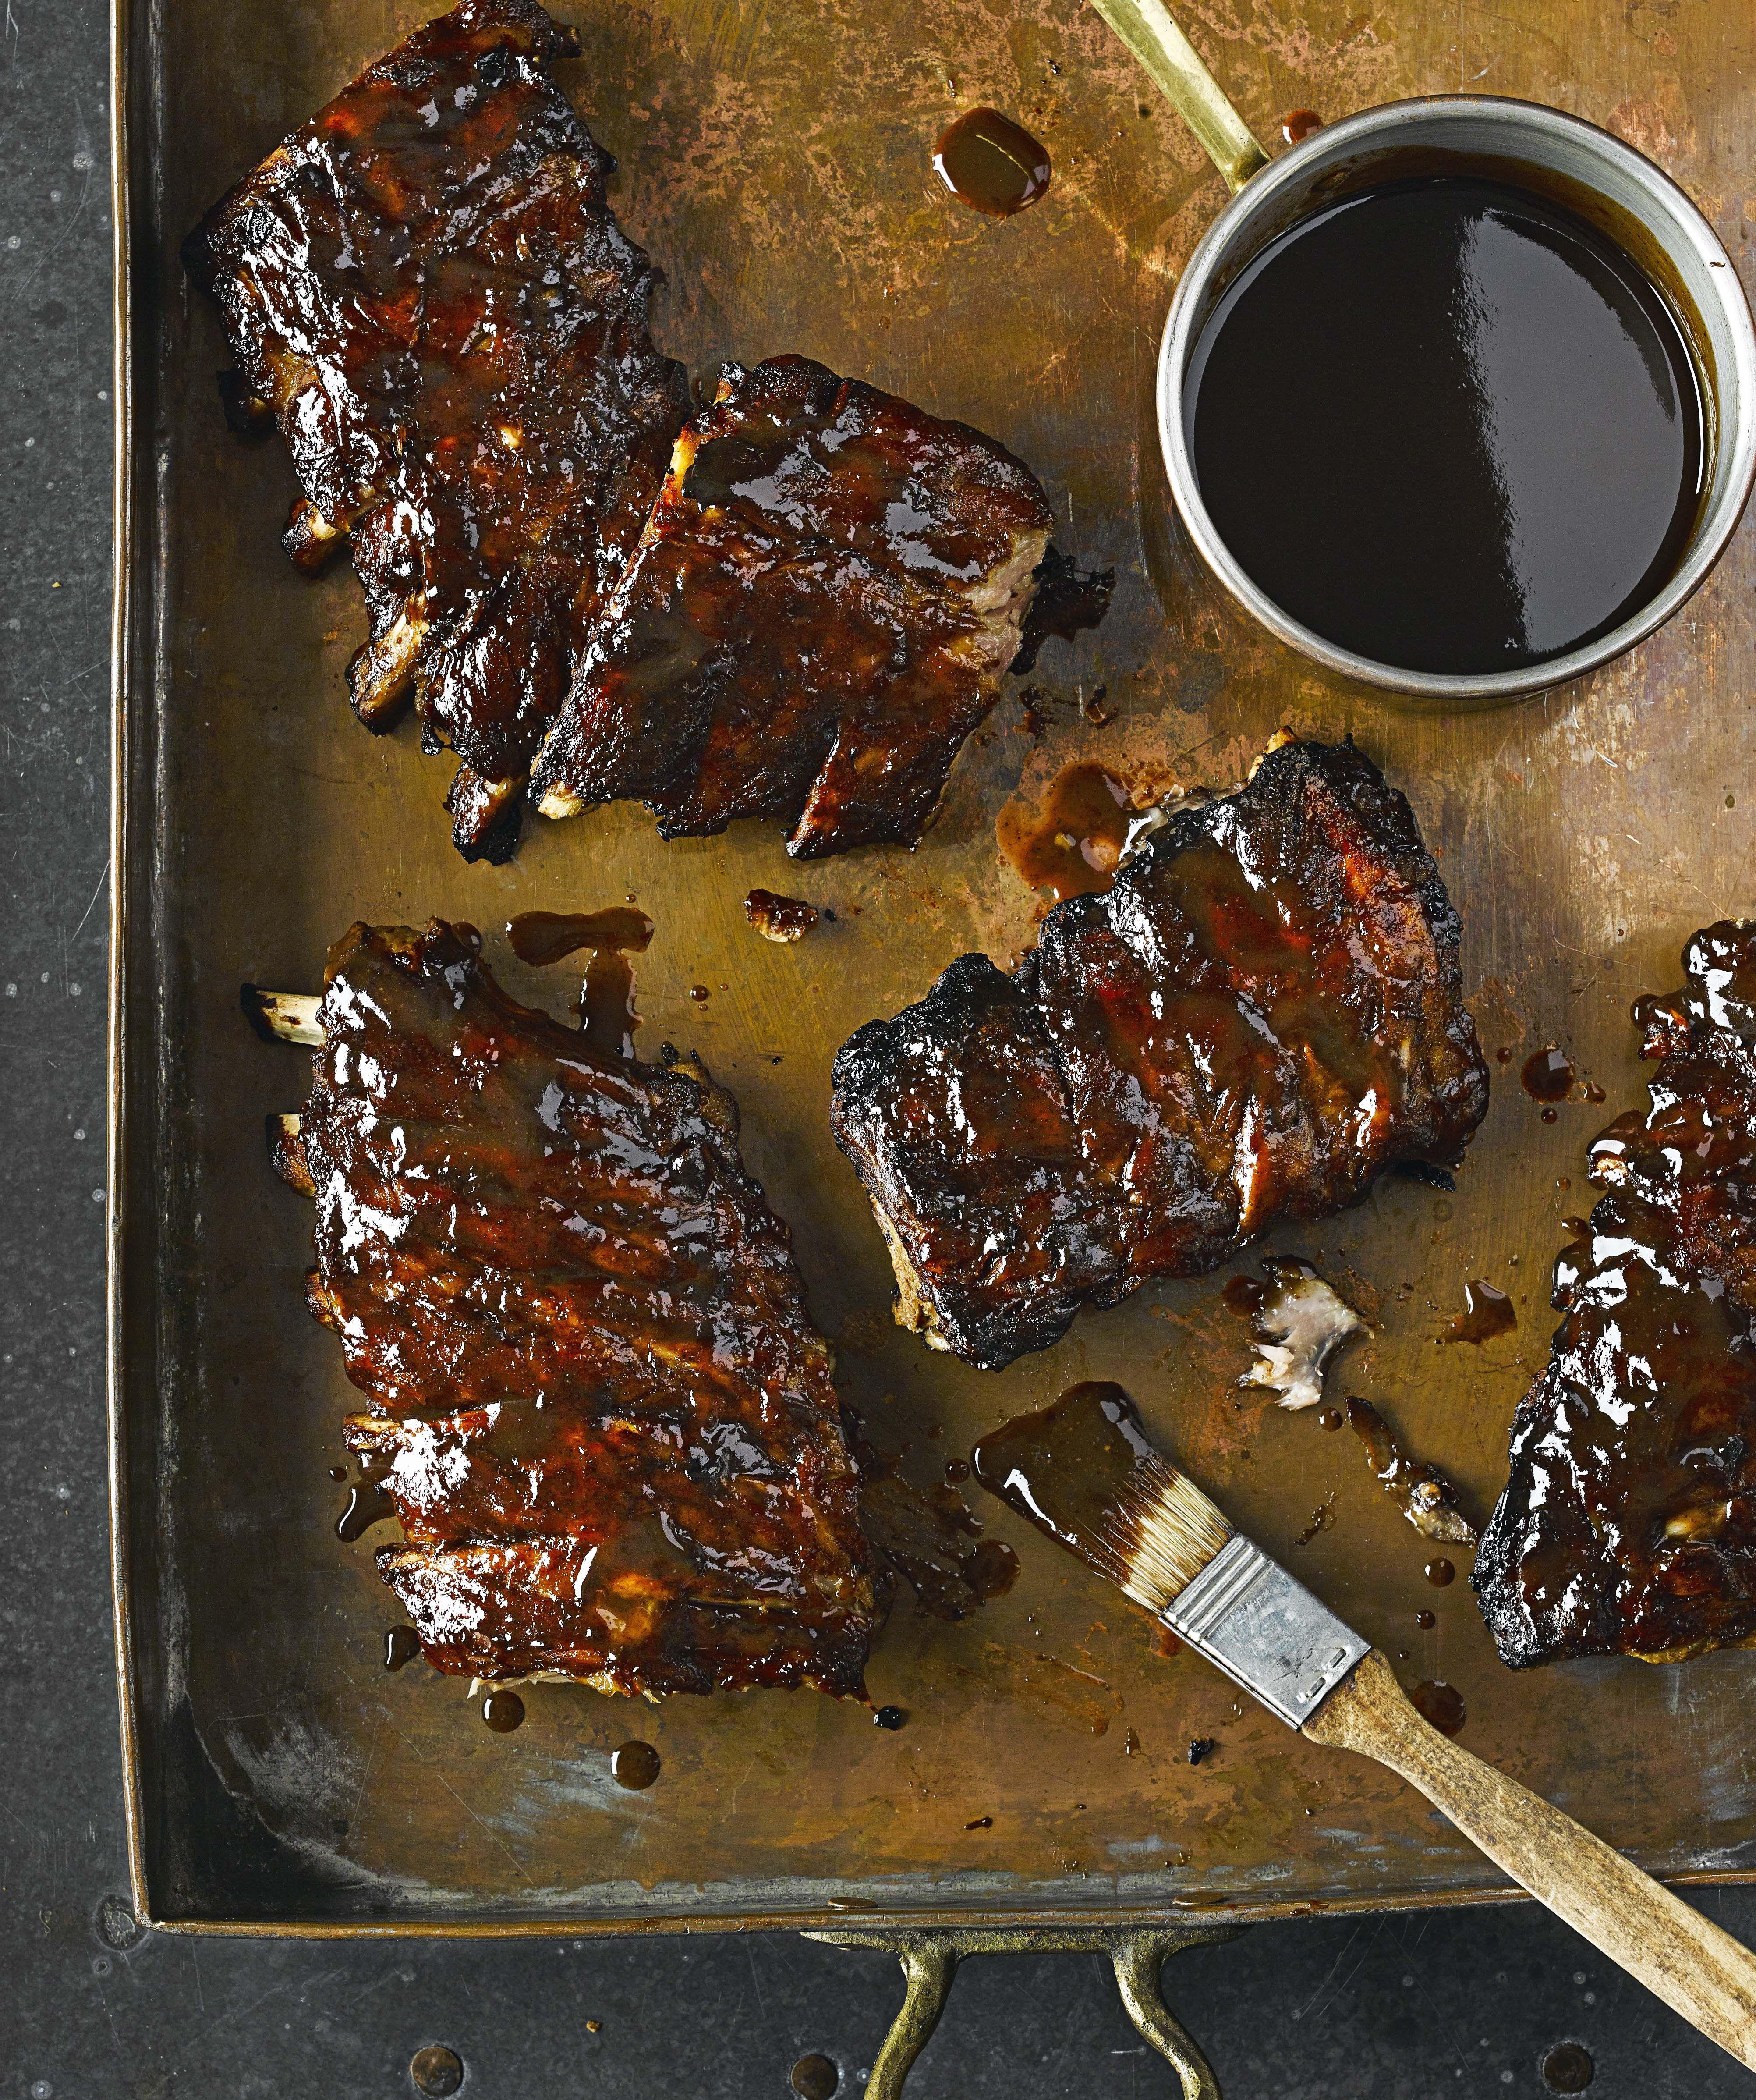 Fall-apart bourbon ribs